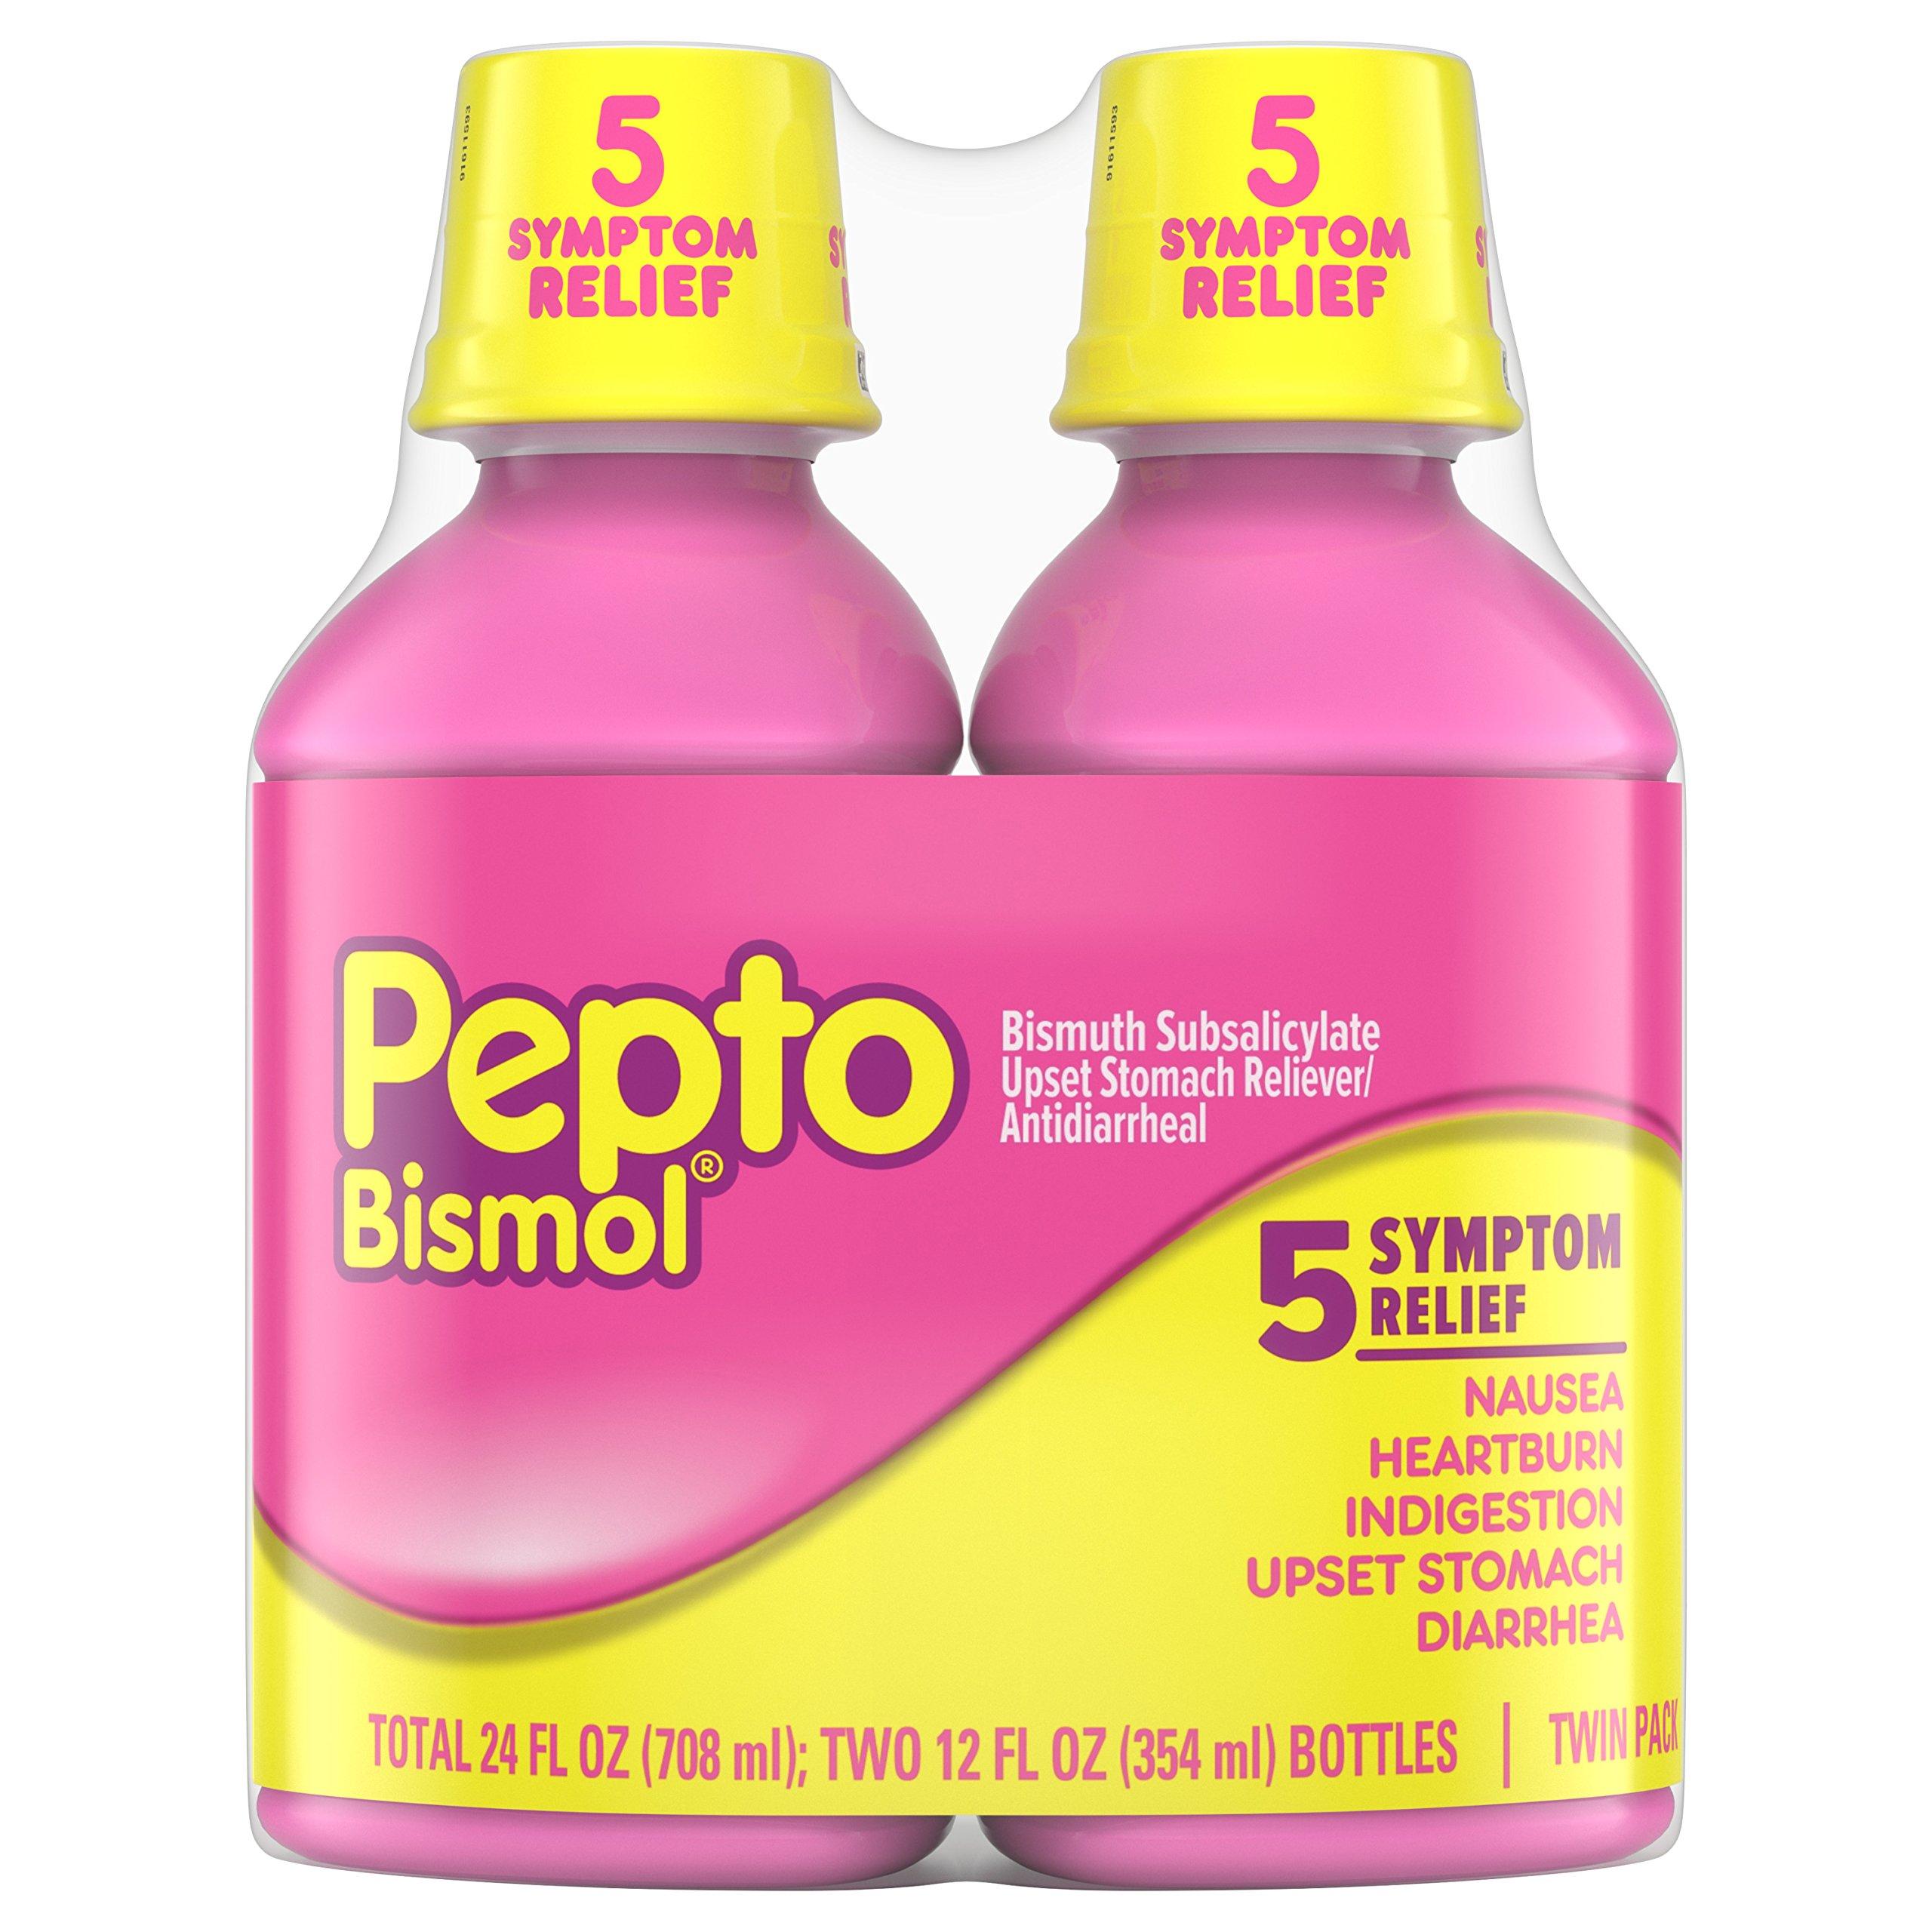 Pepto Bismol Liquid, Upset Stomach Relief, Bismuth Subsalicylate, Multi-Symptom Relief of Gas, Nausea, Heartburn, Indigestion, Upset Stomach, Diarrhea, Twin Pack 12 OZ Liquid